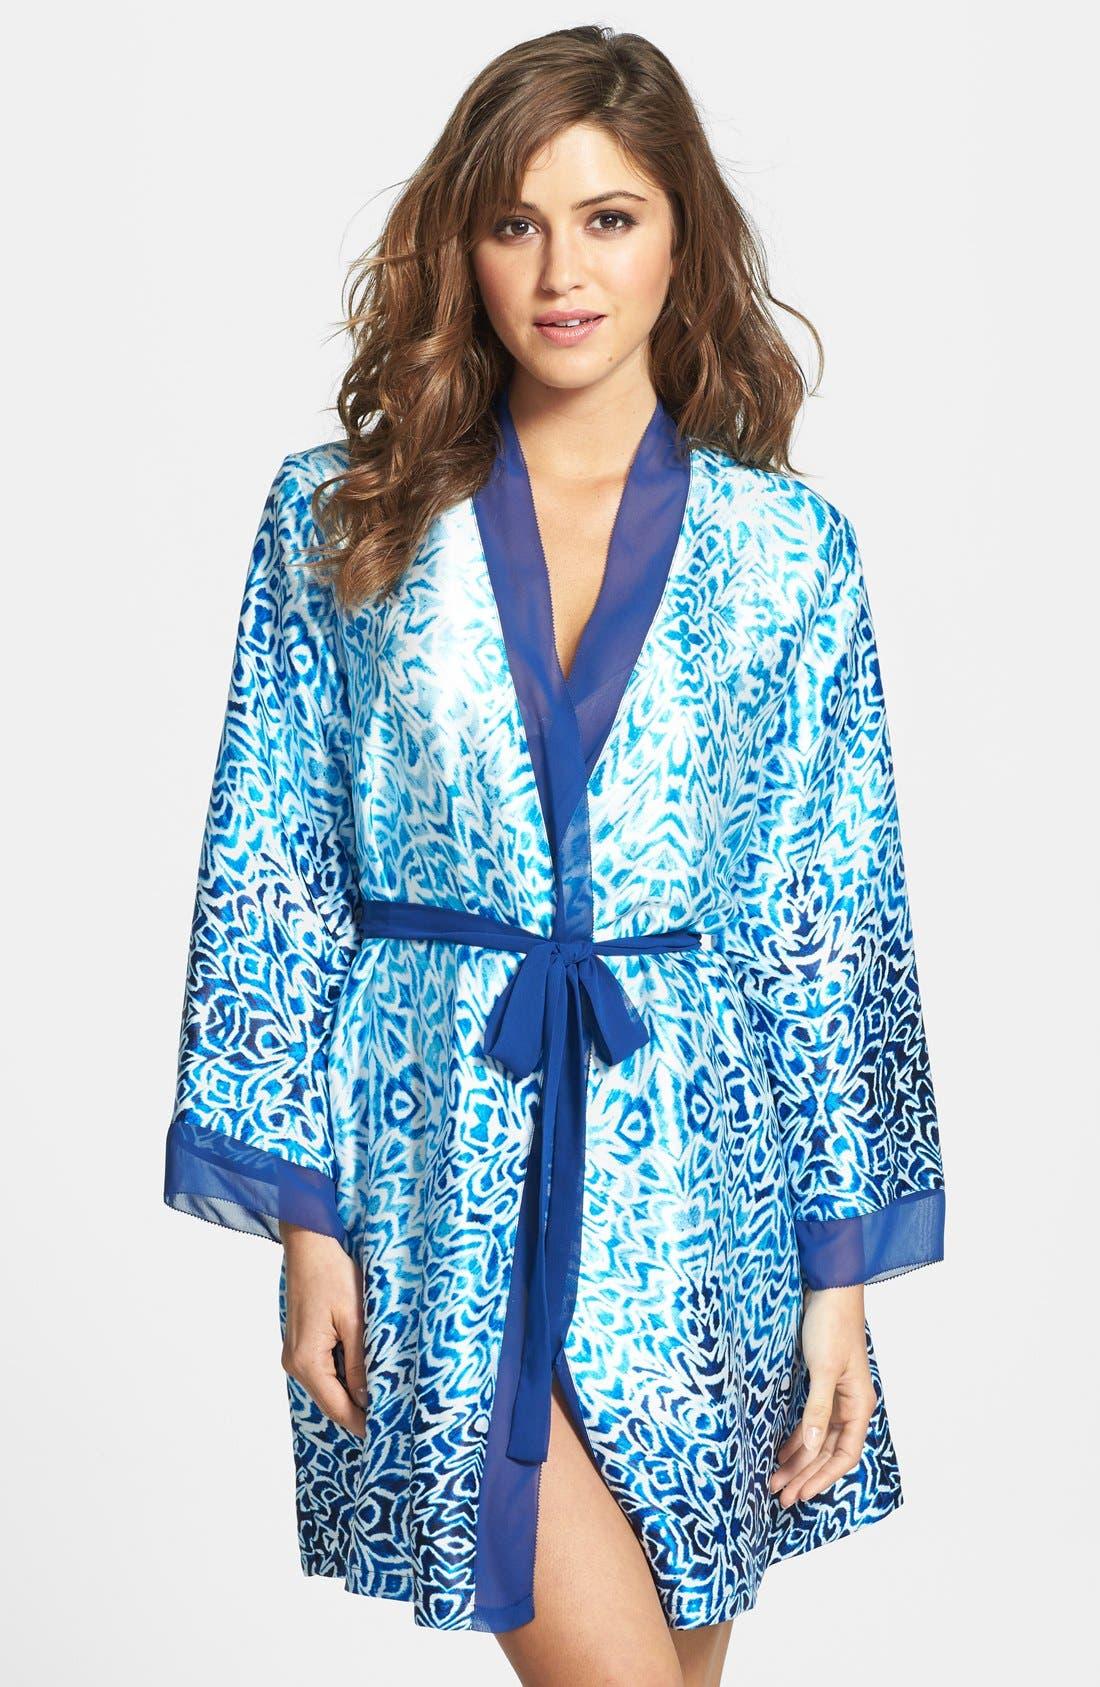 Main Image - Oscar de la Renta Sleepwear 'Ocean Breeze' Satin Charmeuse Wrap Robe